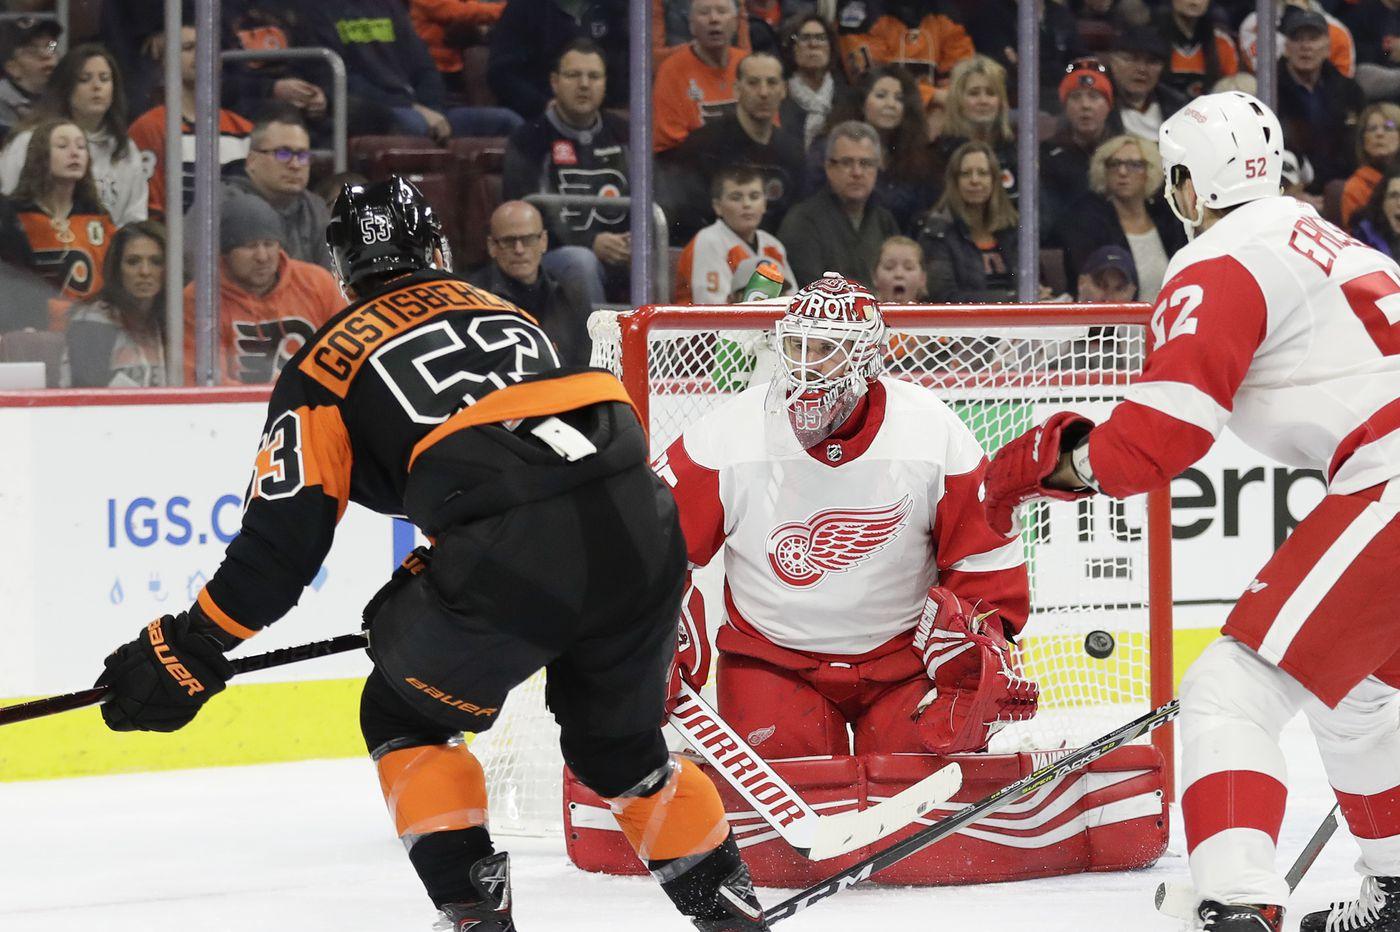 Travis Konecny's goal gives Flyers a 6-5 OT win over Detroit